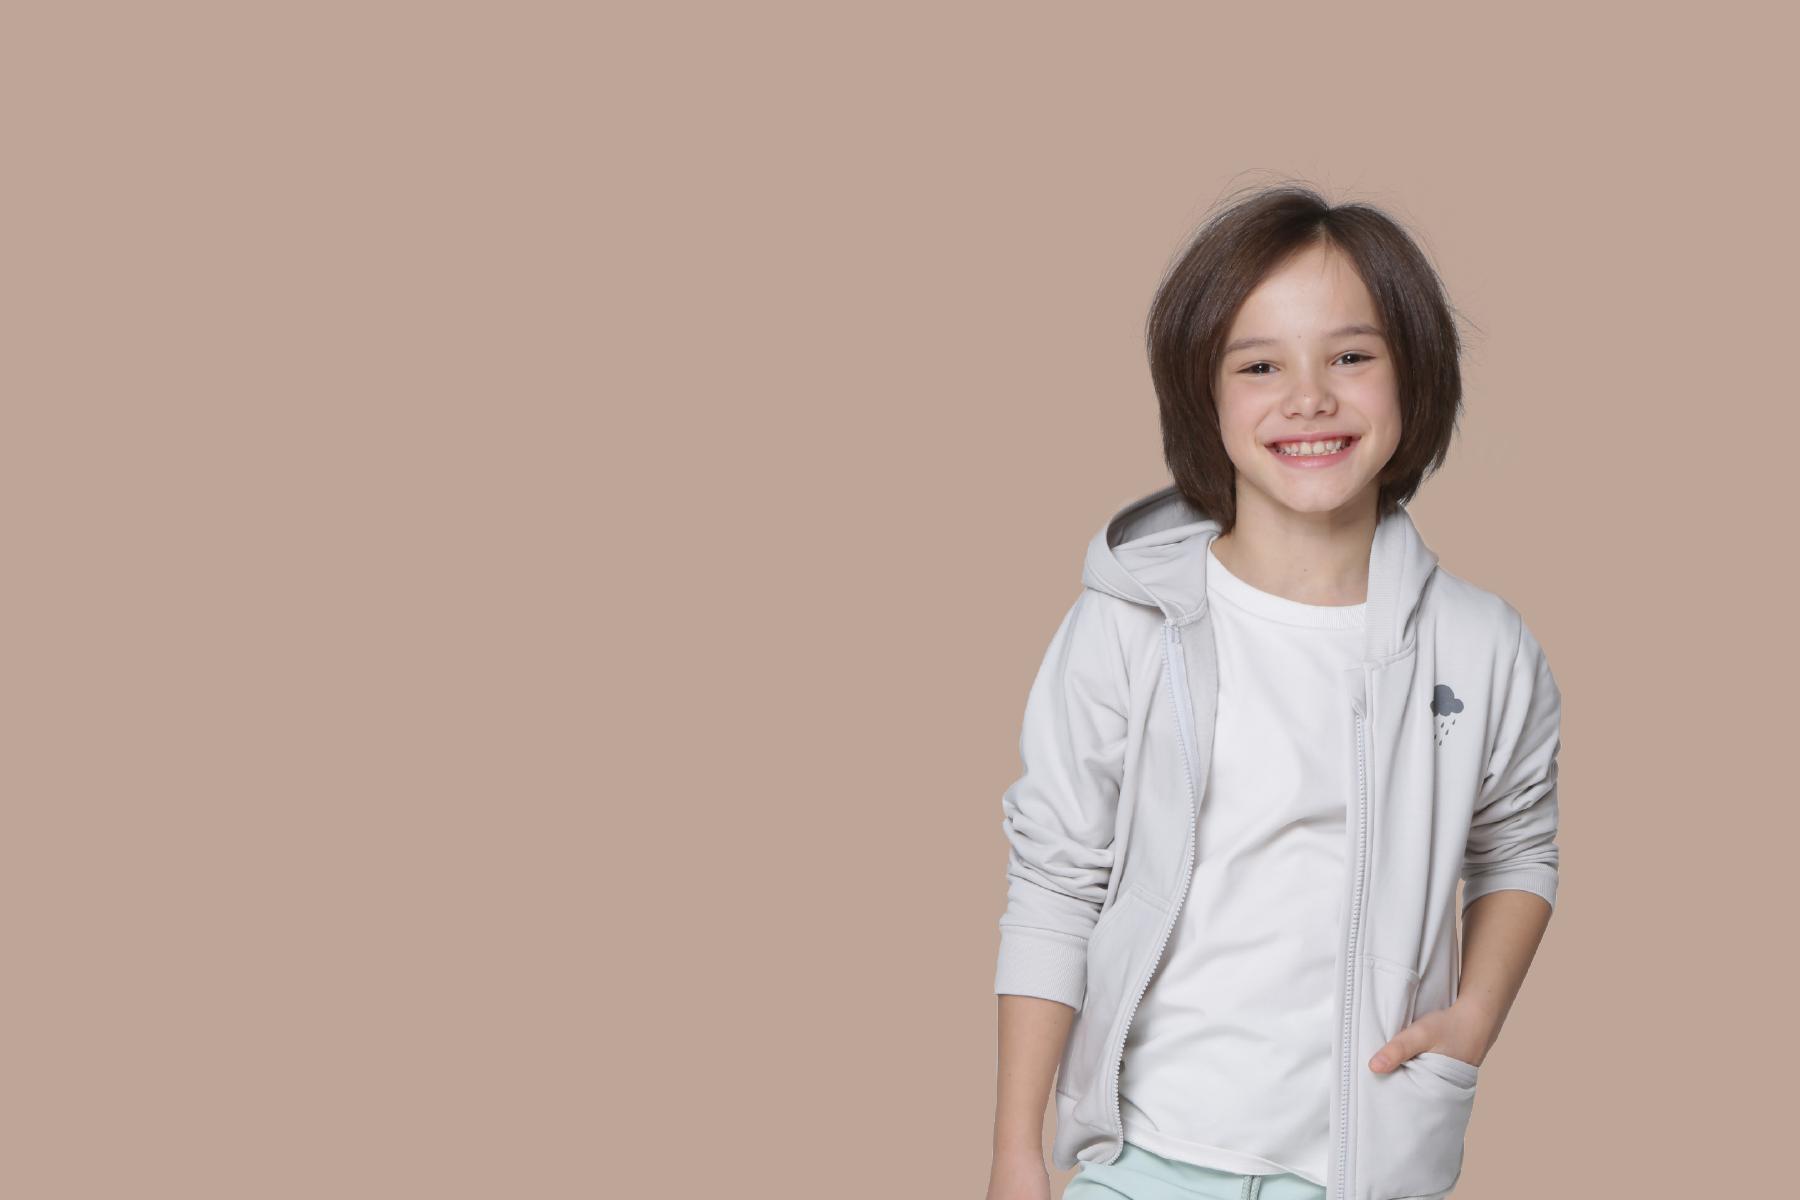 kidswear-designer-cornwall-england04